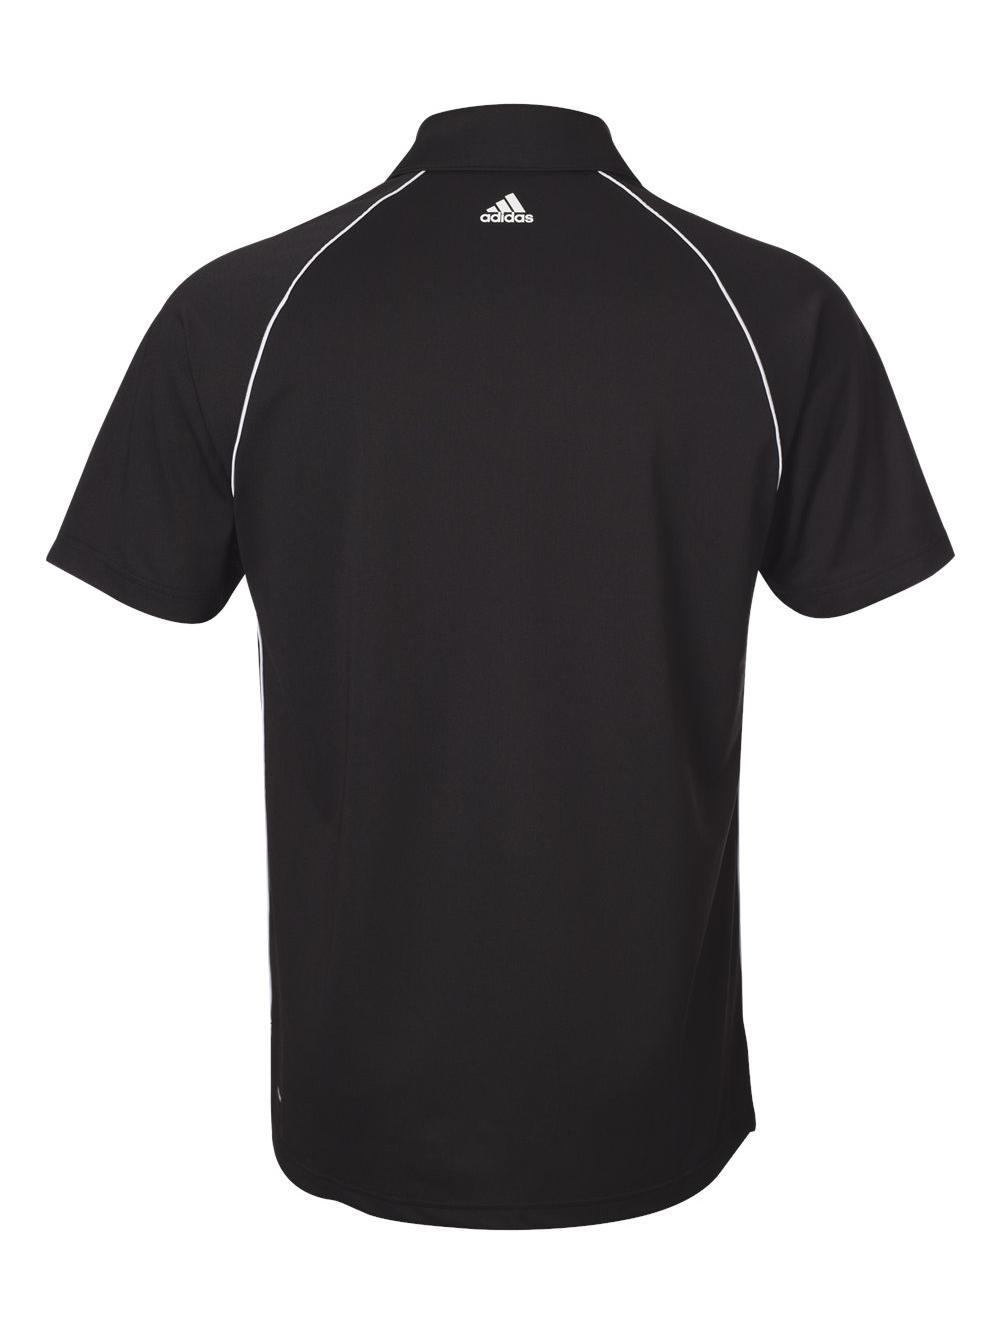 Adidas-Golf-ClimaLite-Piped-Polo-A82 thumbnail 4